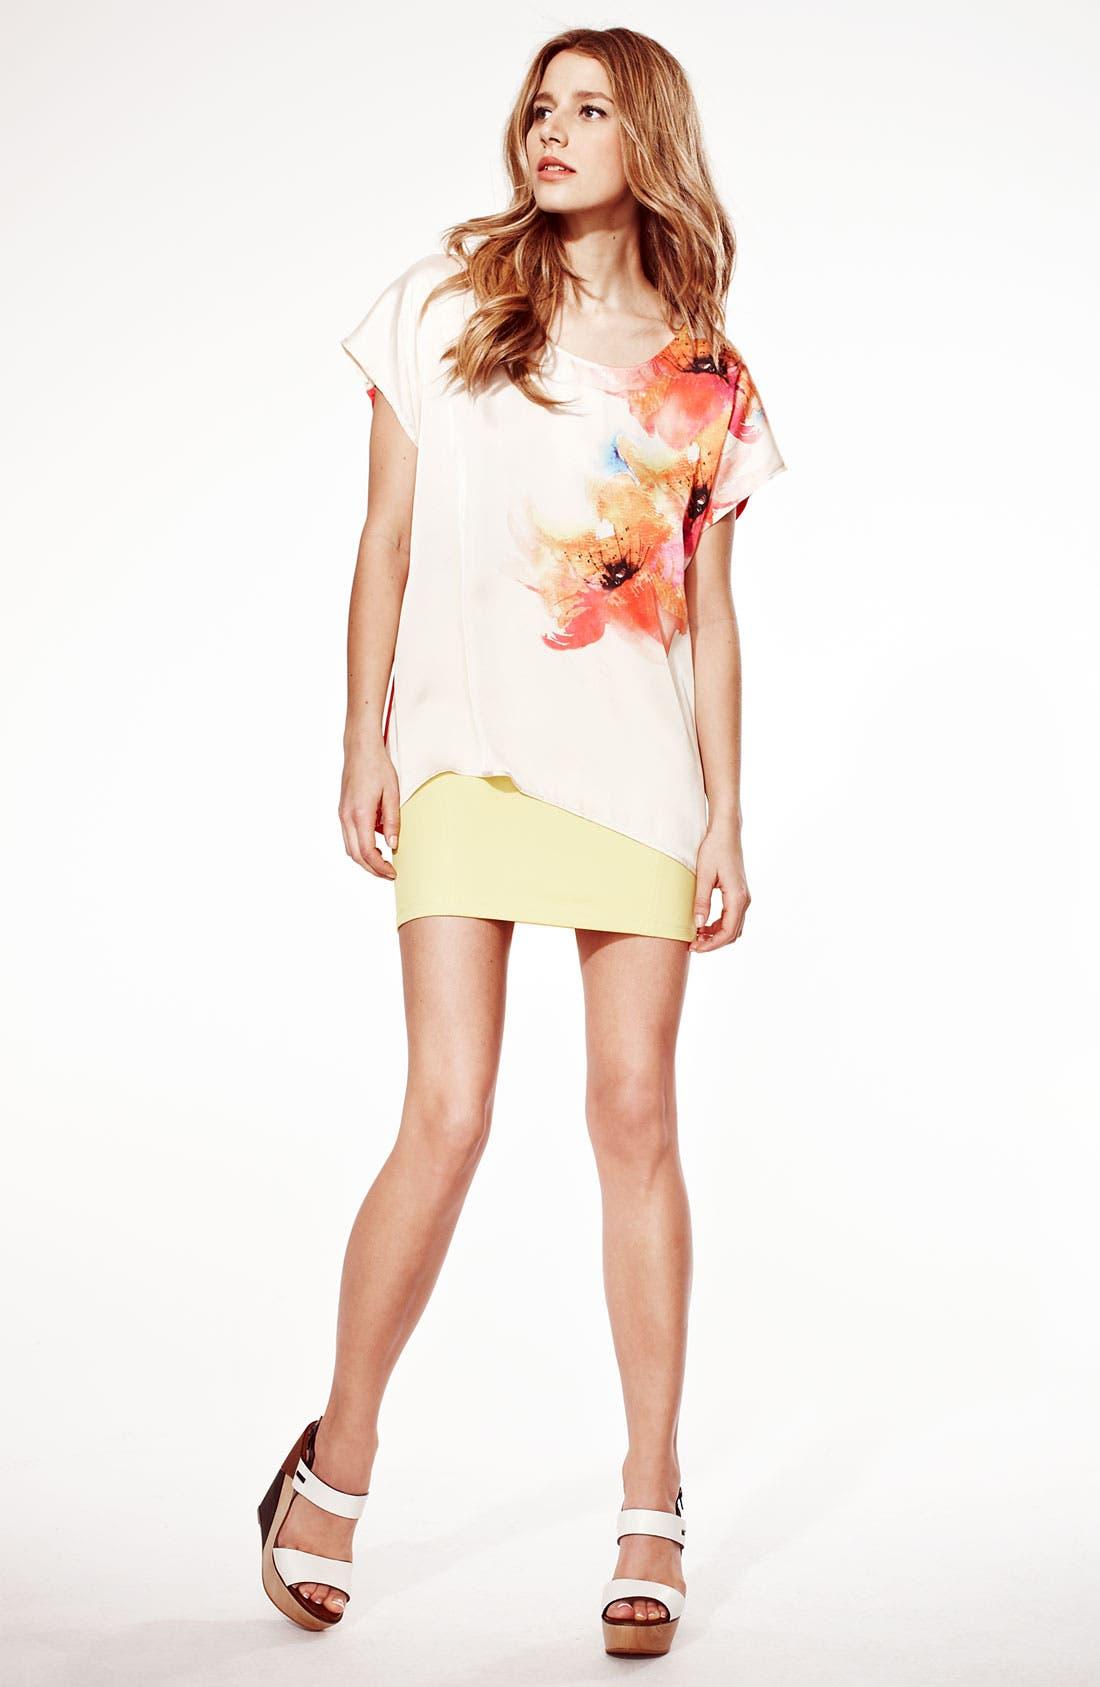 Alternate Image 1 Selected - Bellatrix Top & LMK Miniskirt